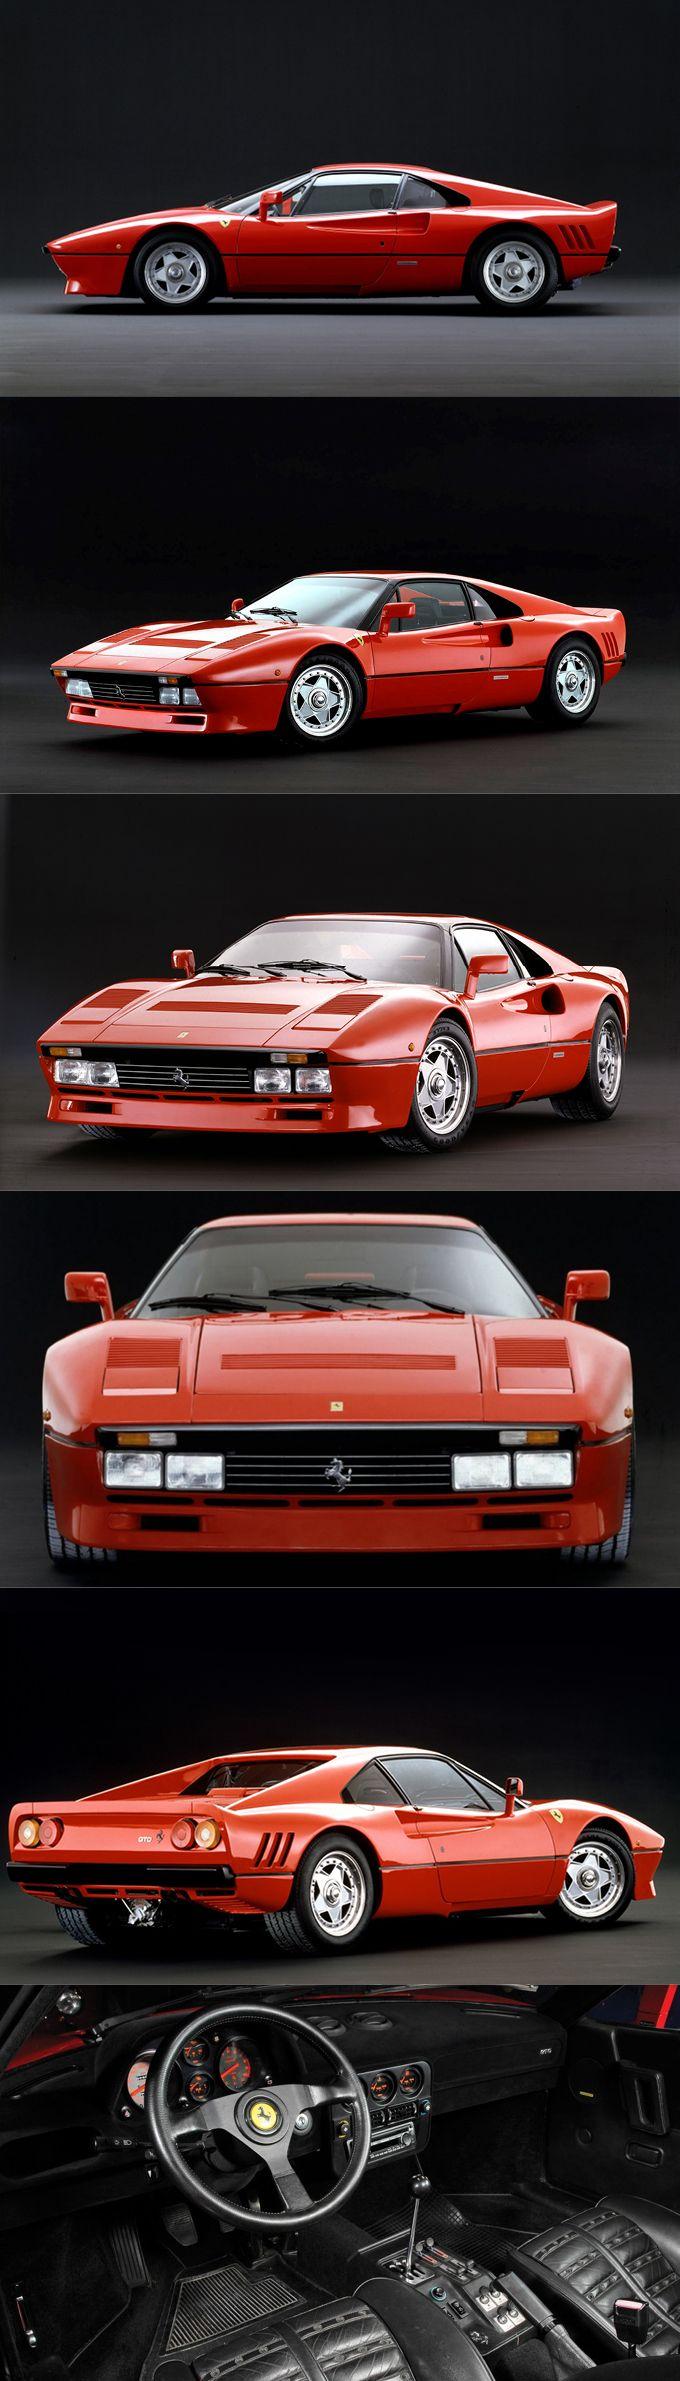 1984 Ferrari 288 GTO / Group B homologation / 272pcs / red / Italy / Leonardo Fioravanti @ Pininfarina